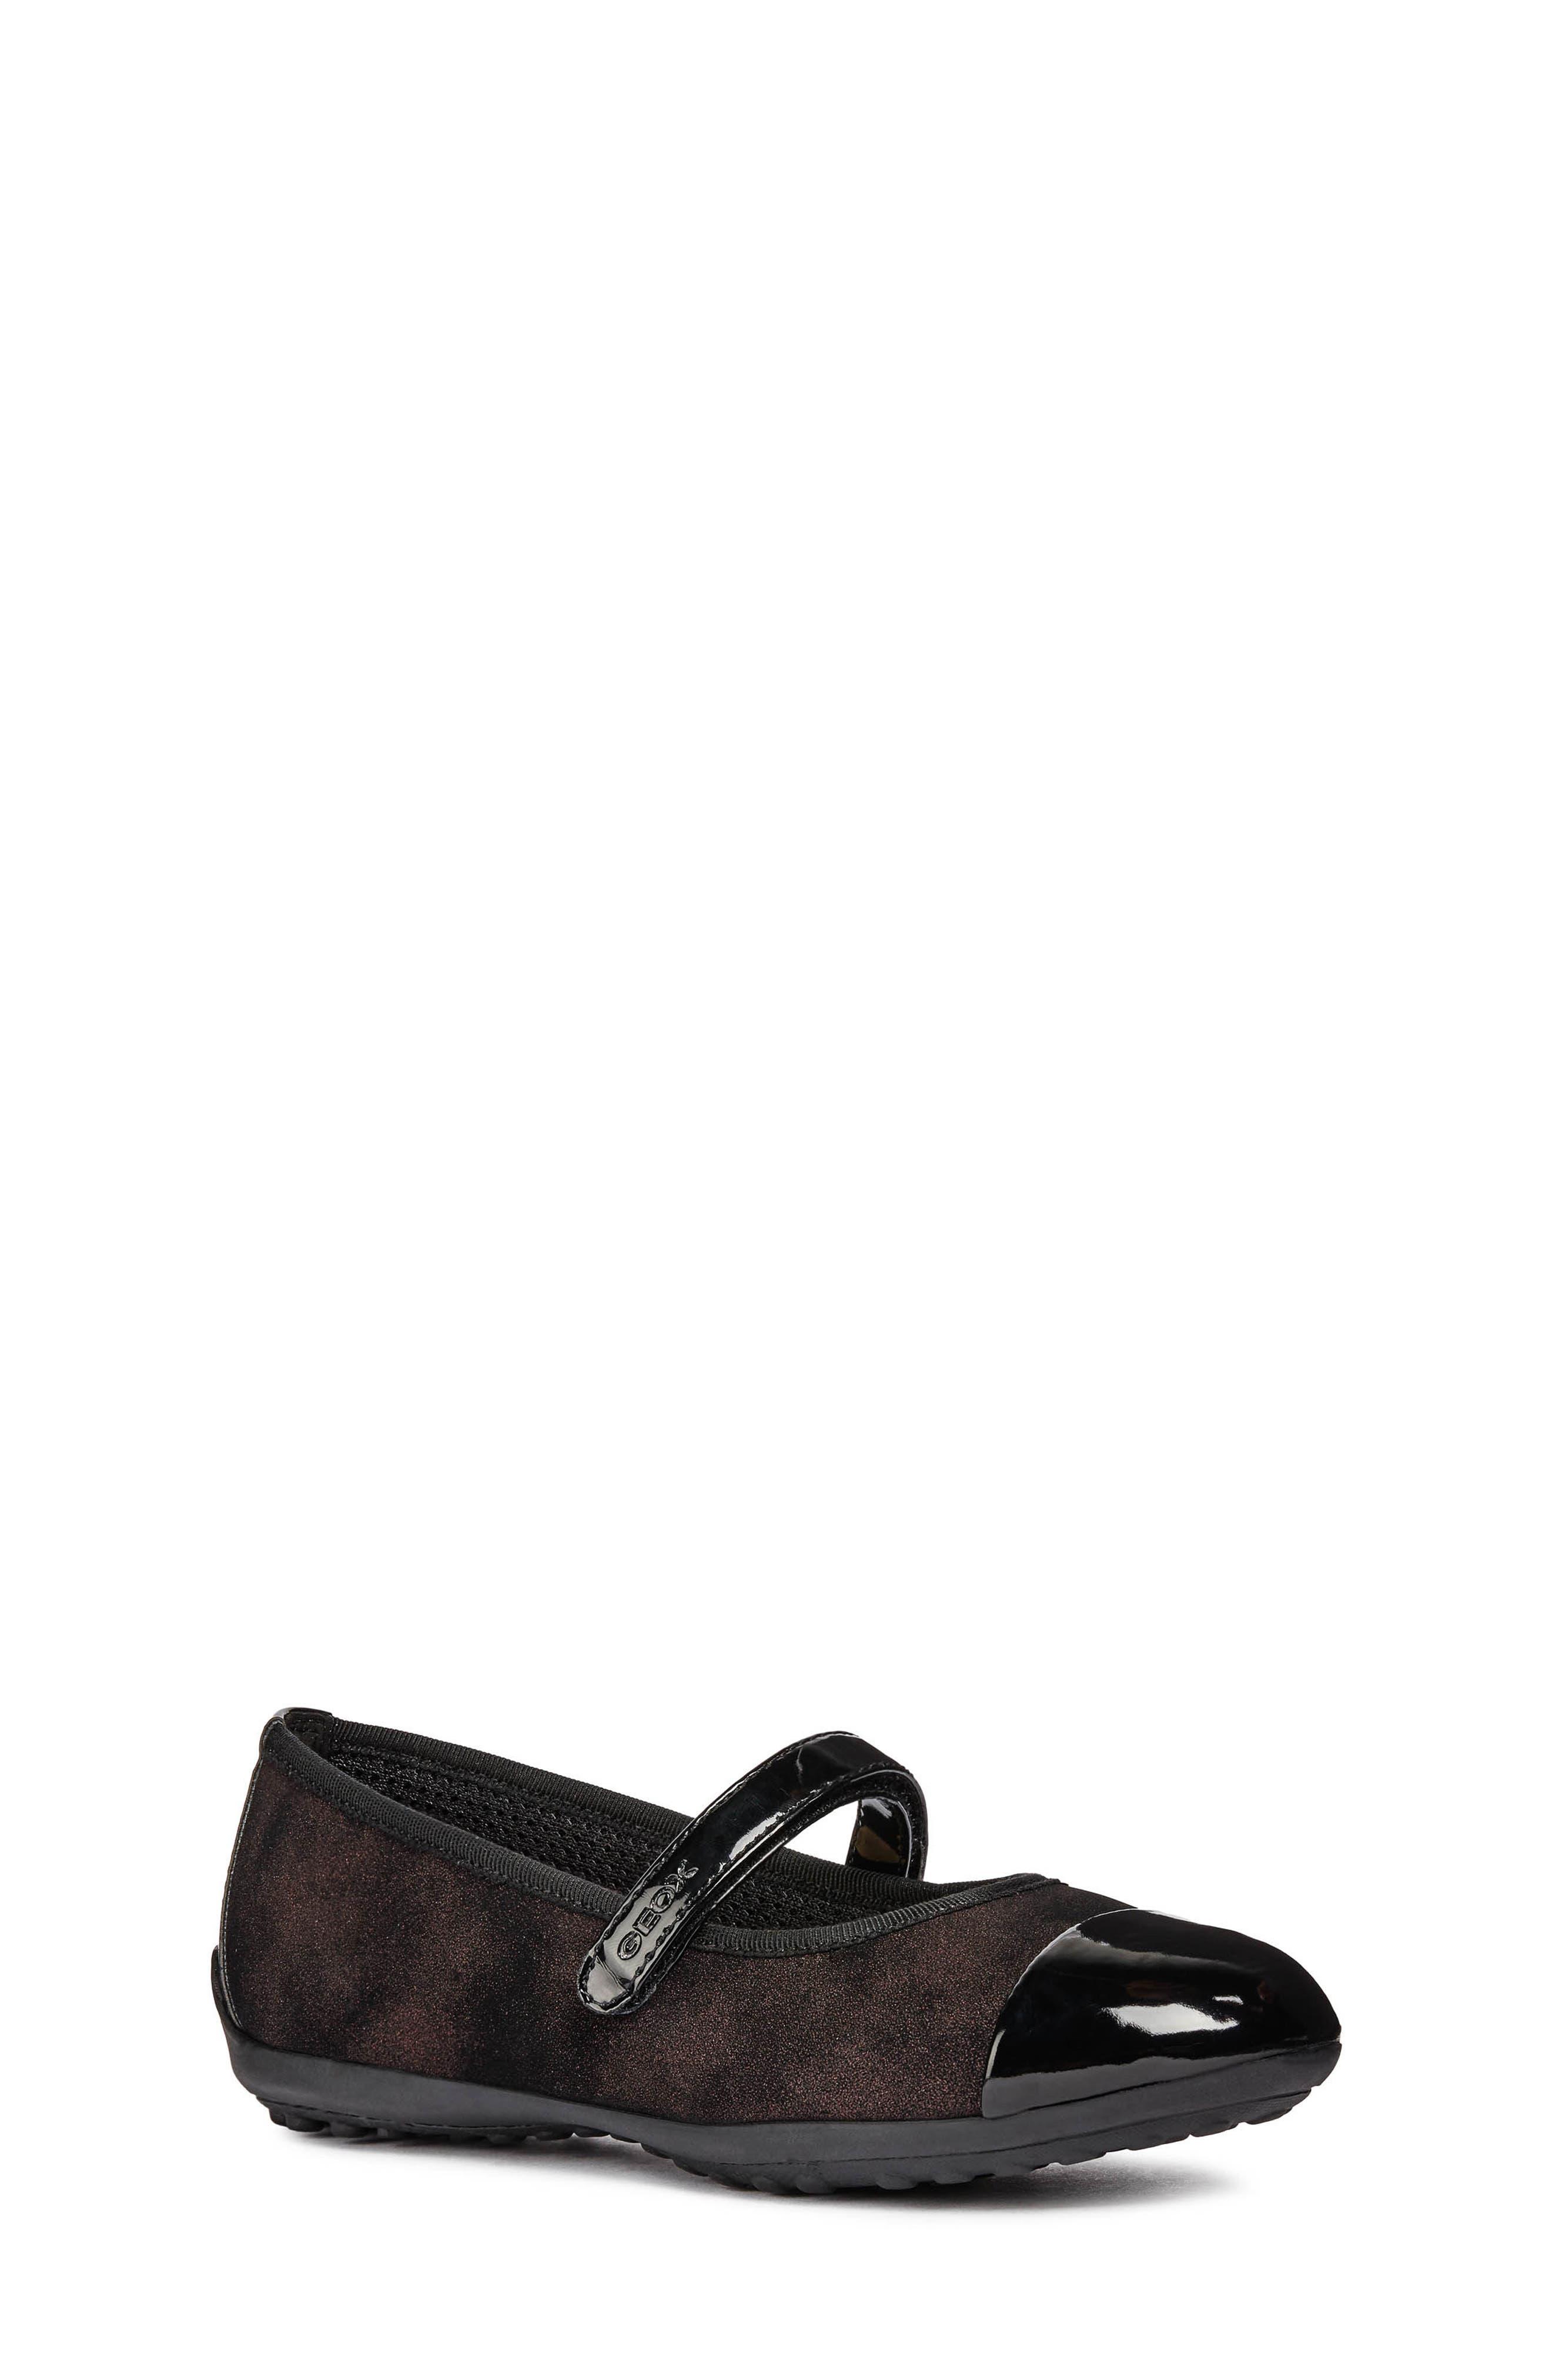 Piuma Mary Jane Flat,                         Main,                         color, BLACK/ BORDEAUX